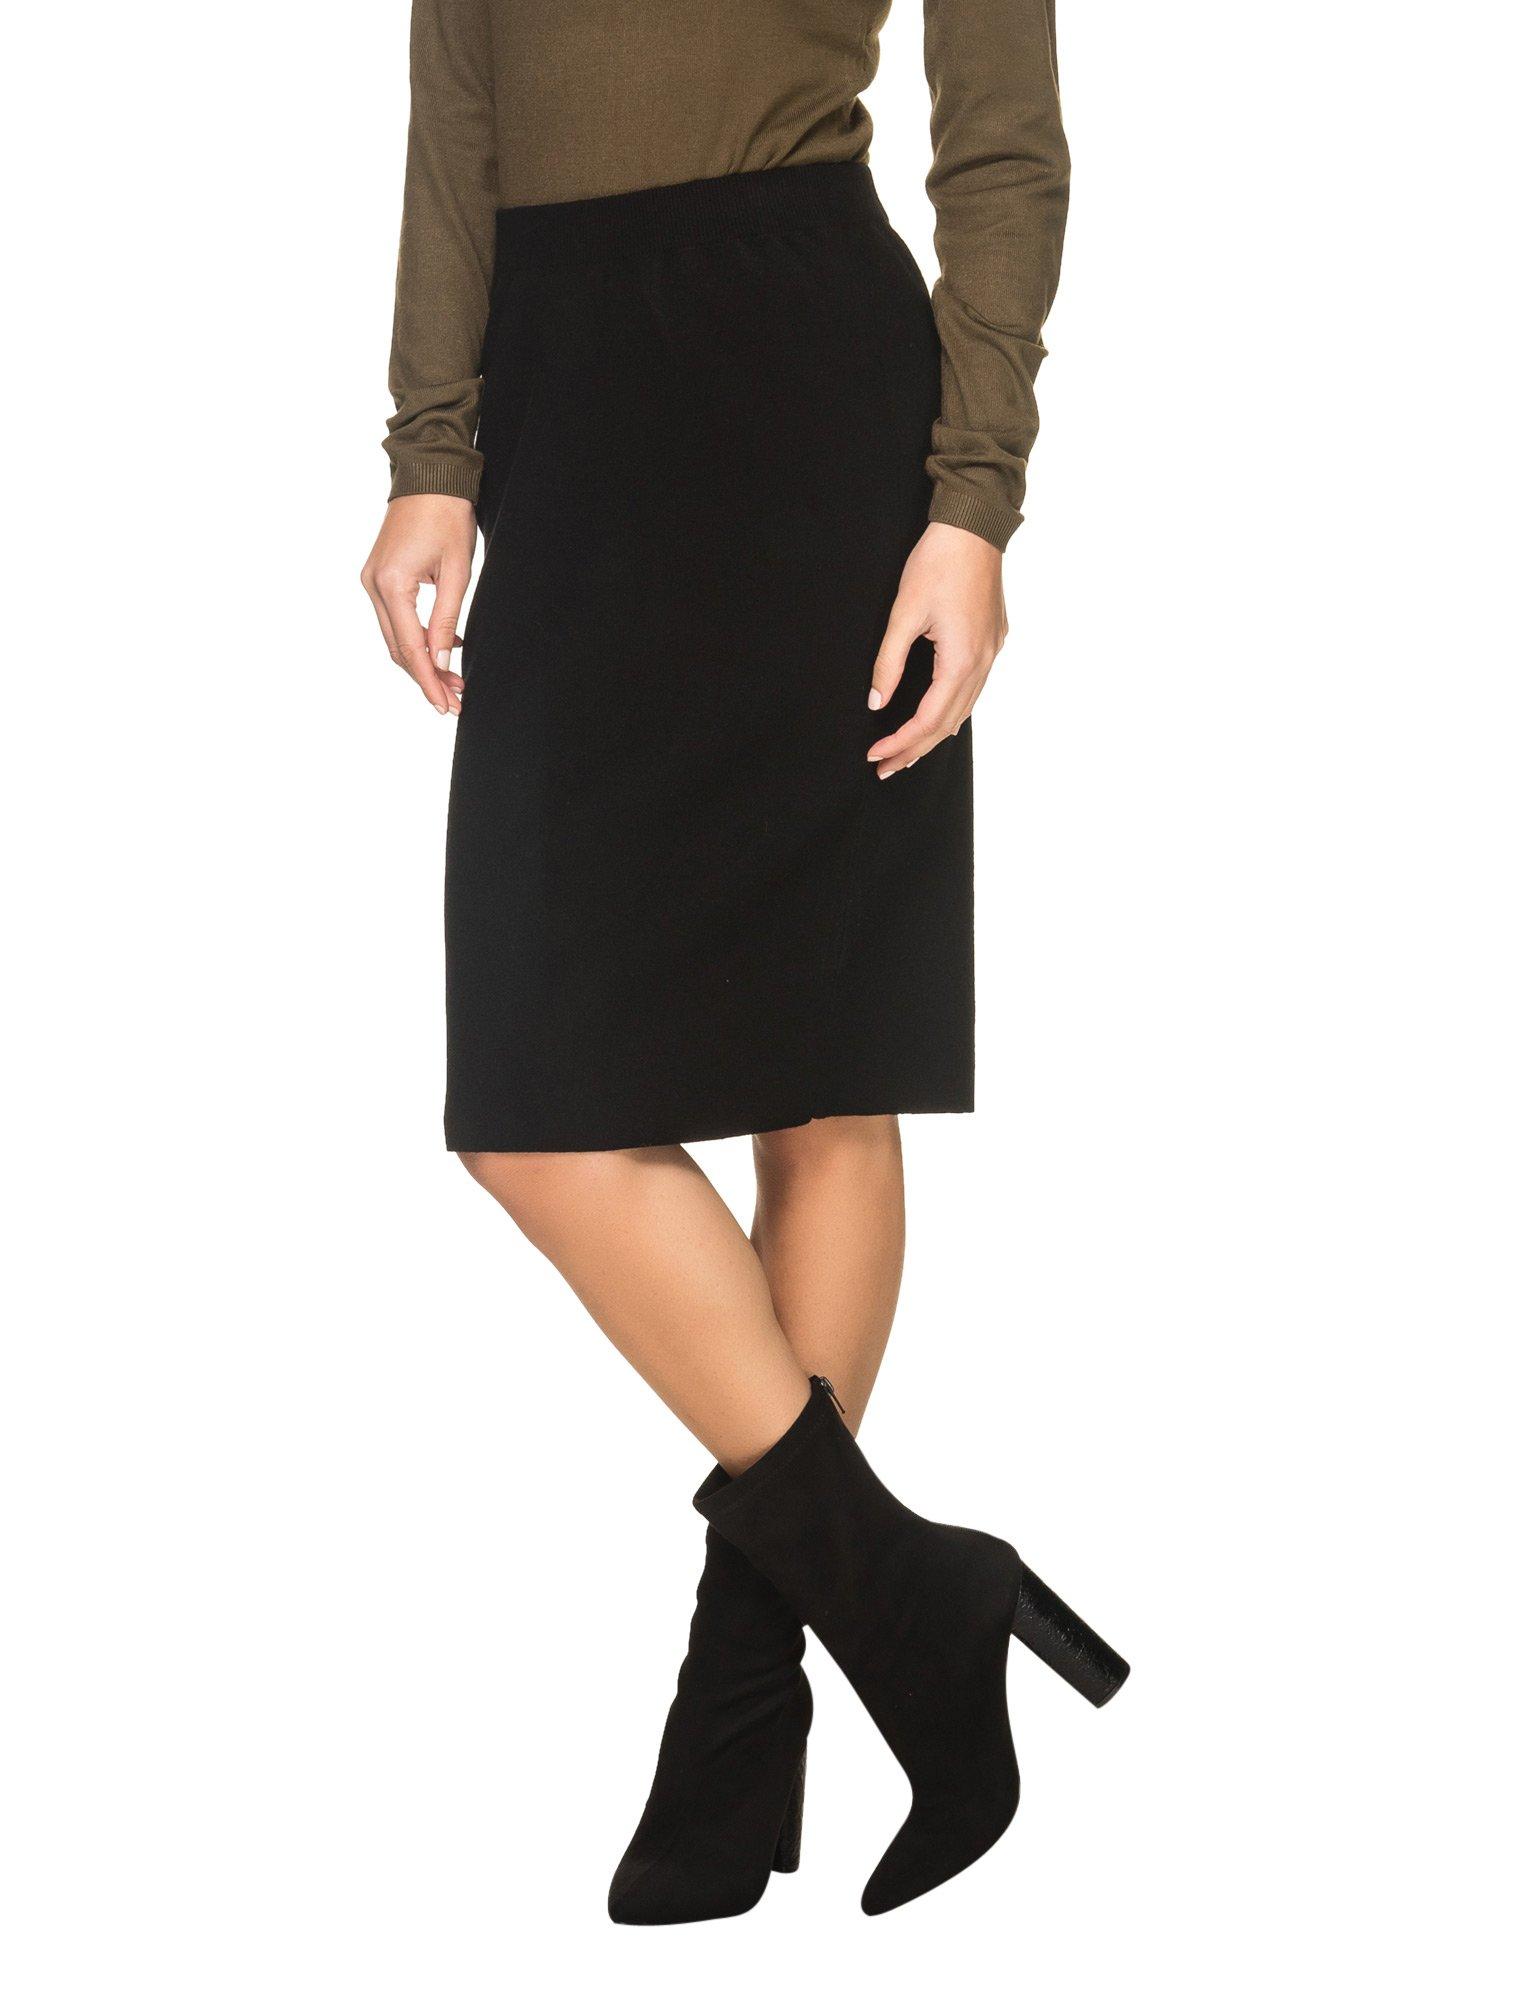 Ichi Women's Elements Women's Black Midi Skirt in Size L Black